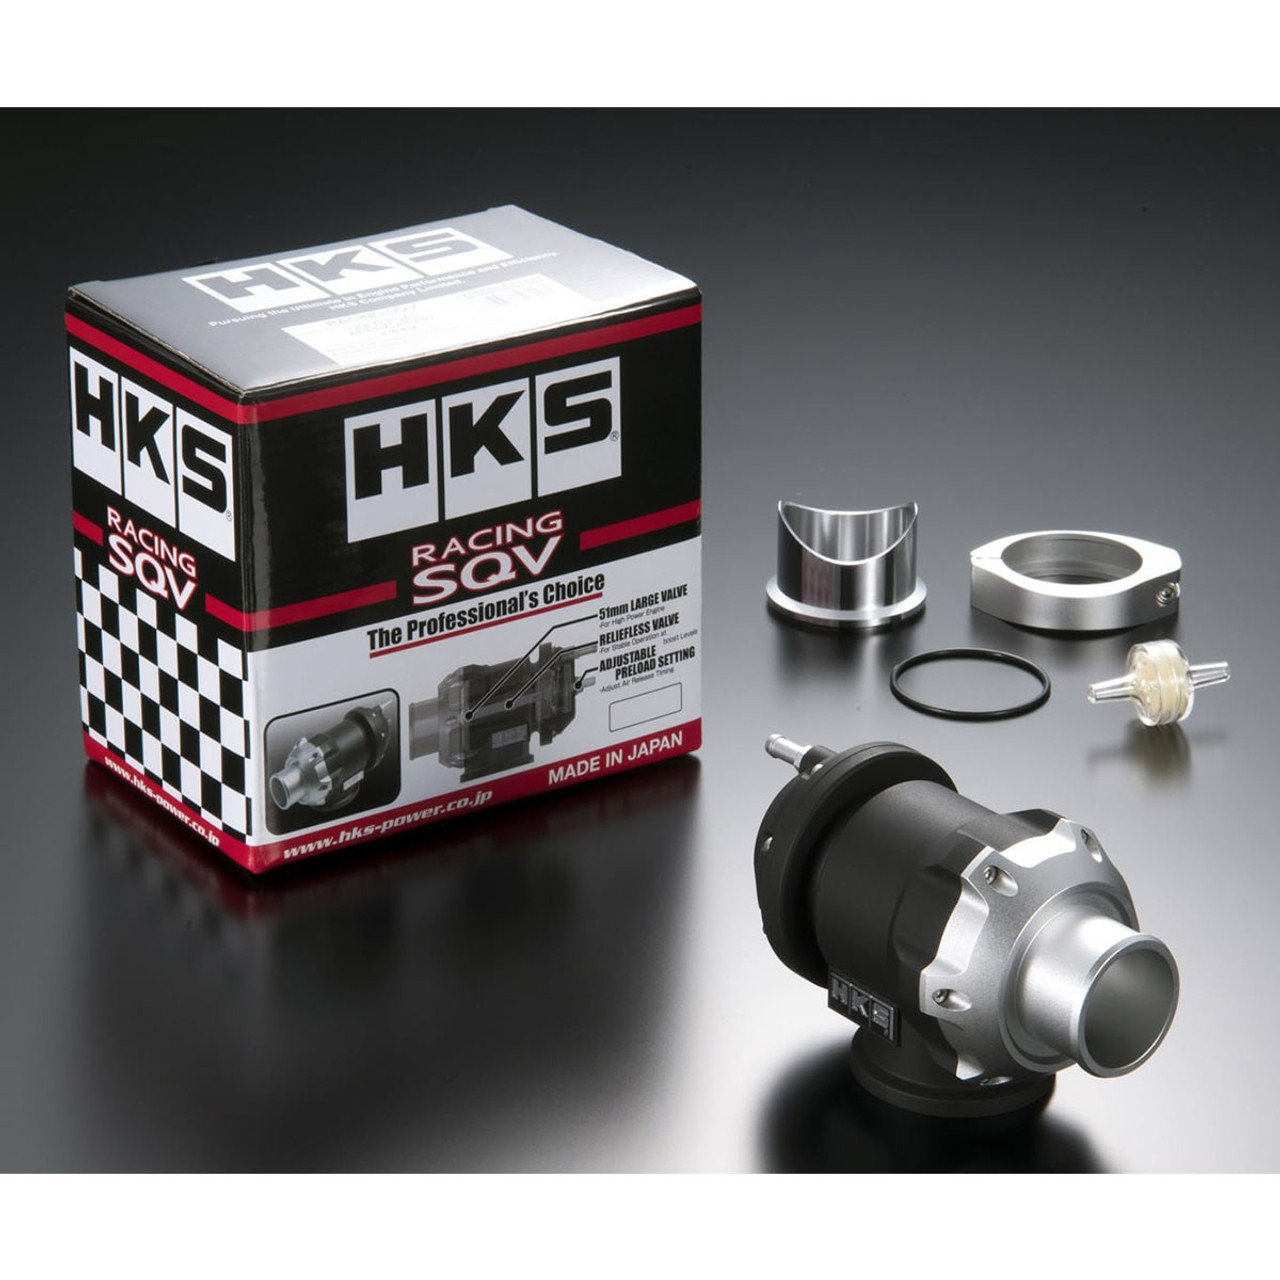 HKS (71008-AK004) RACING SQV, UNIVERSAL BLOW OFF VALVE